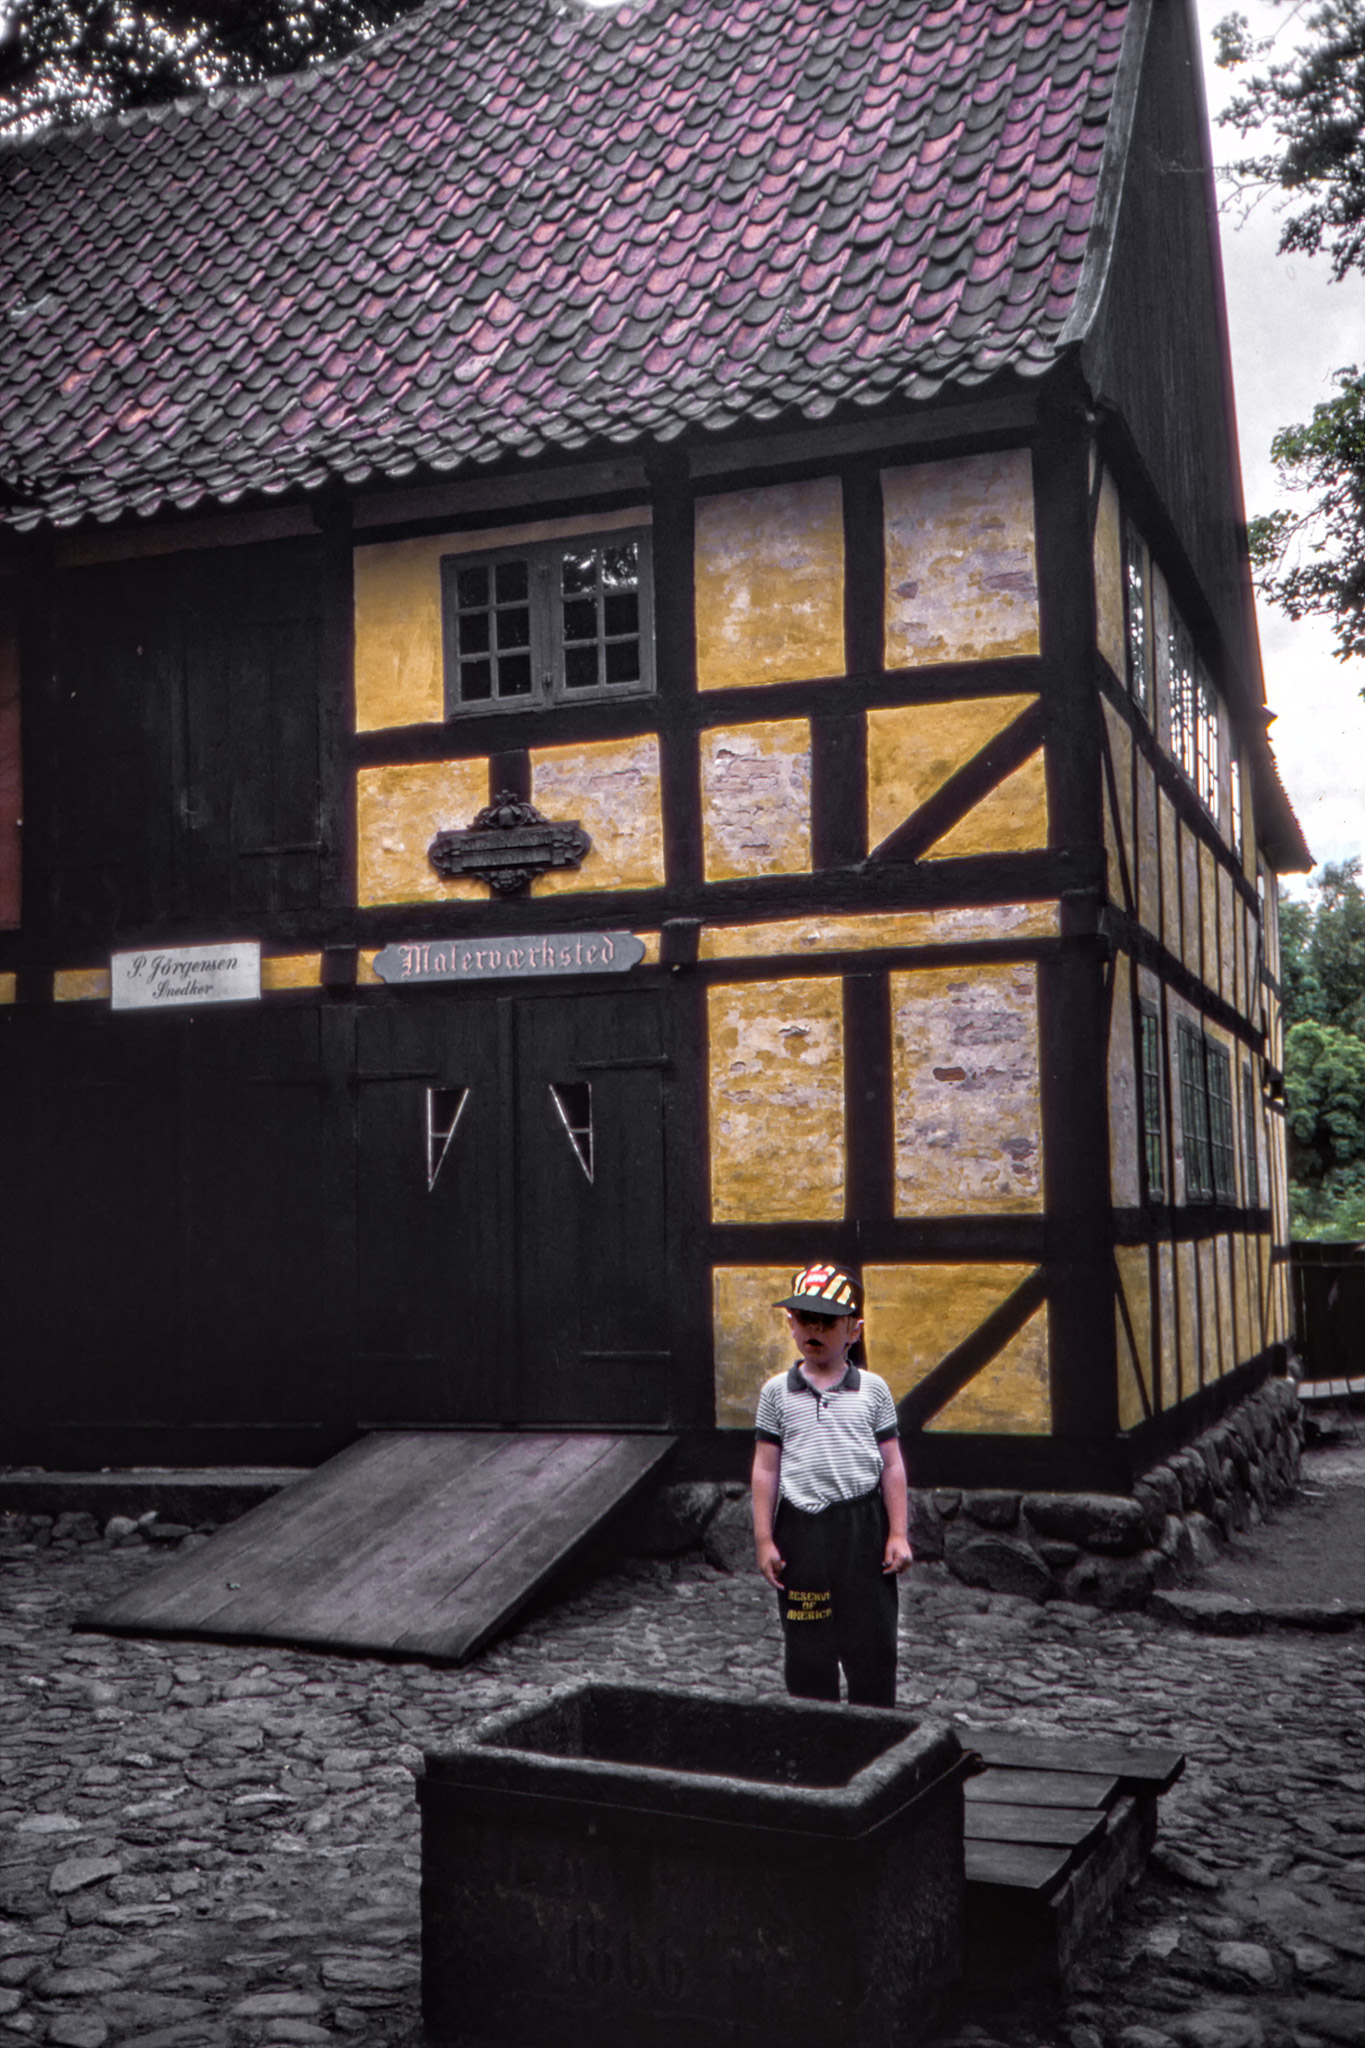 Arvid i den Gamle By i Århus.